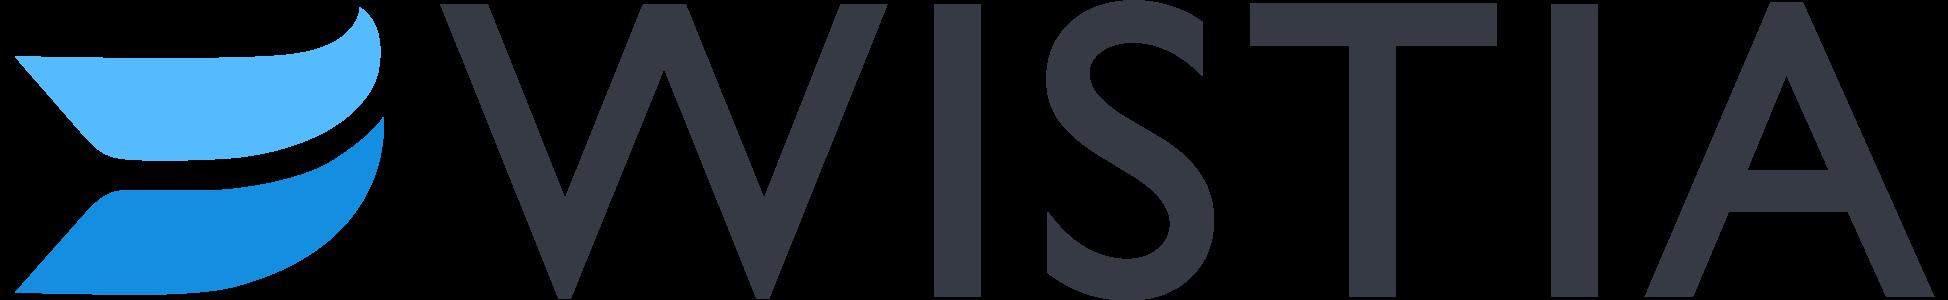 wistia-logo-5.png